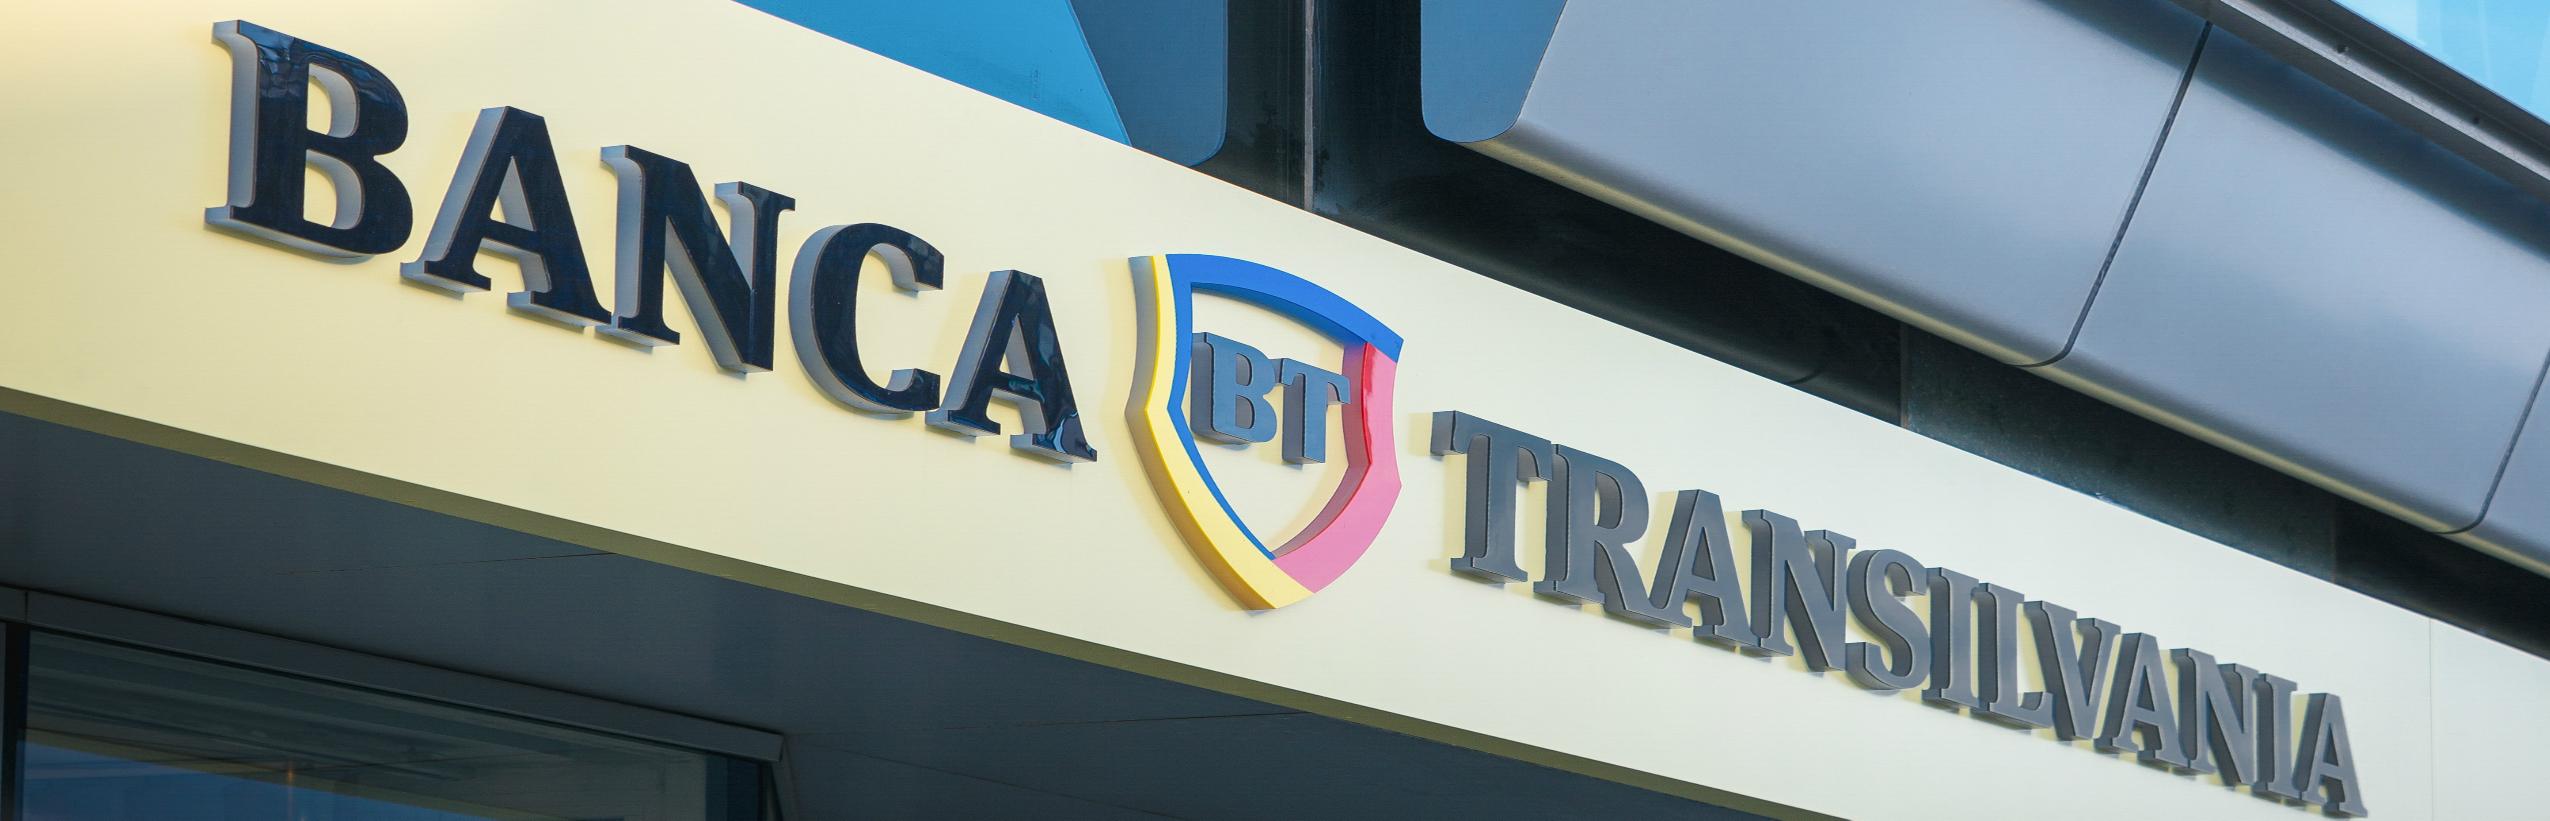 BT, cel mai valoros brand bancar din Romania, conform Brand Finance 2017